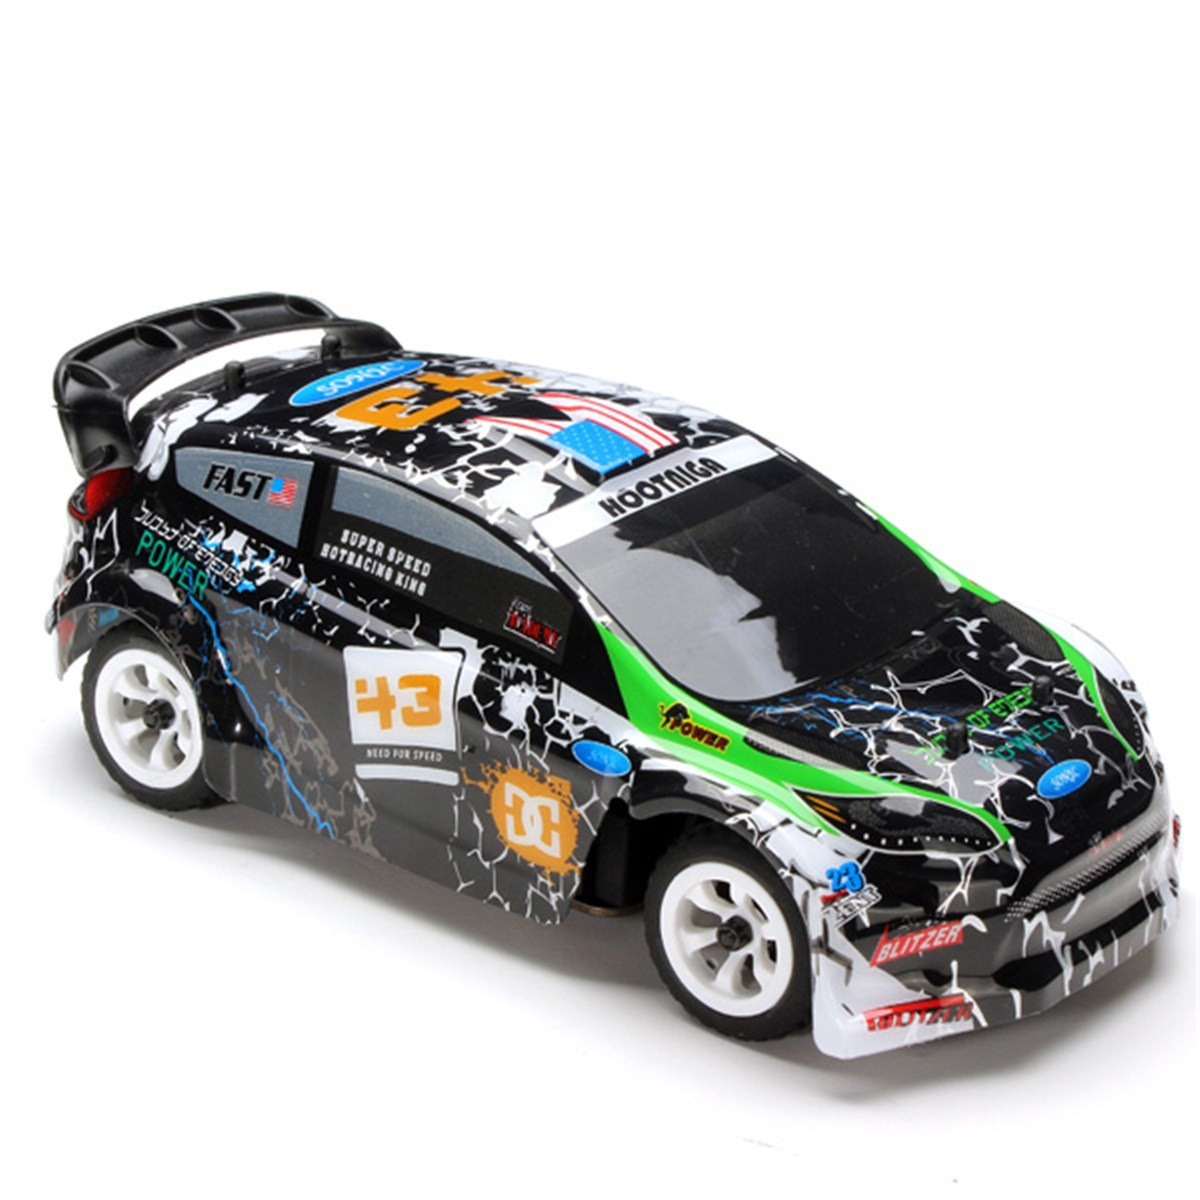 Wltoys K989 1/28 2,4 г 4WD щеткой RC дистанционное управление ралли автомобиль RTR